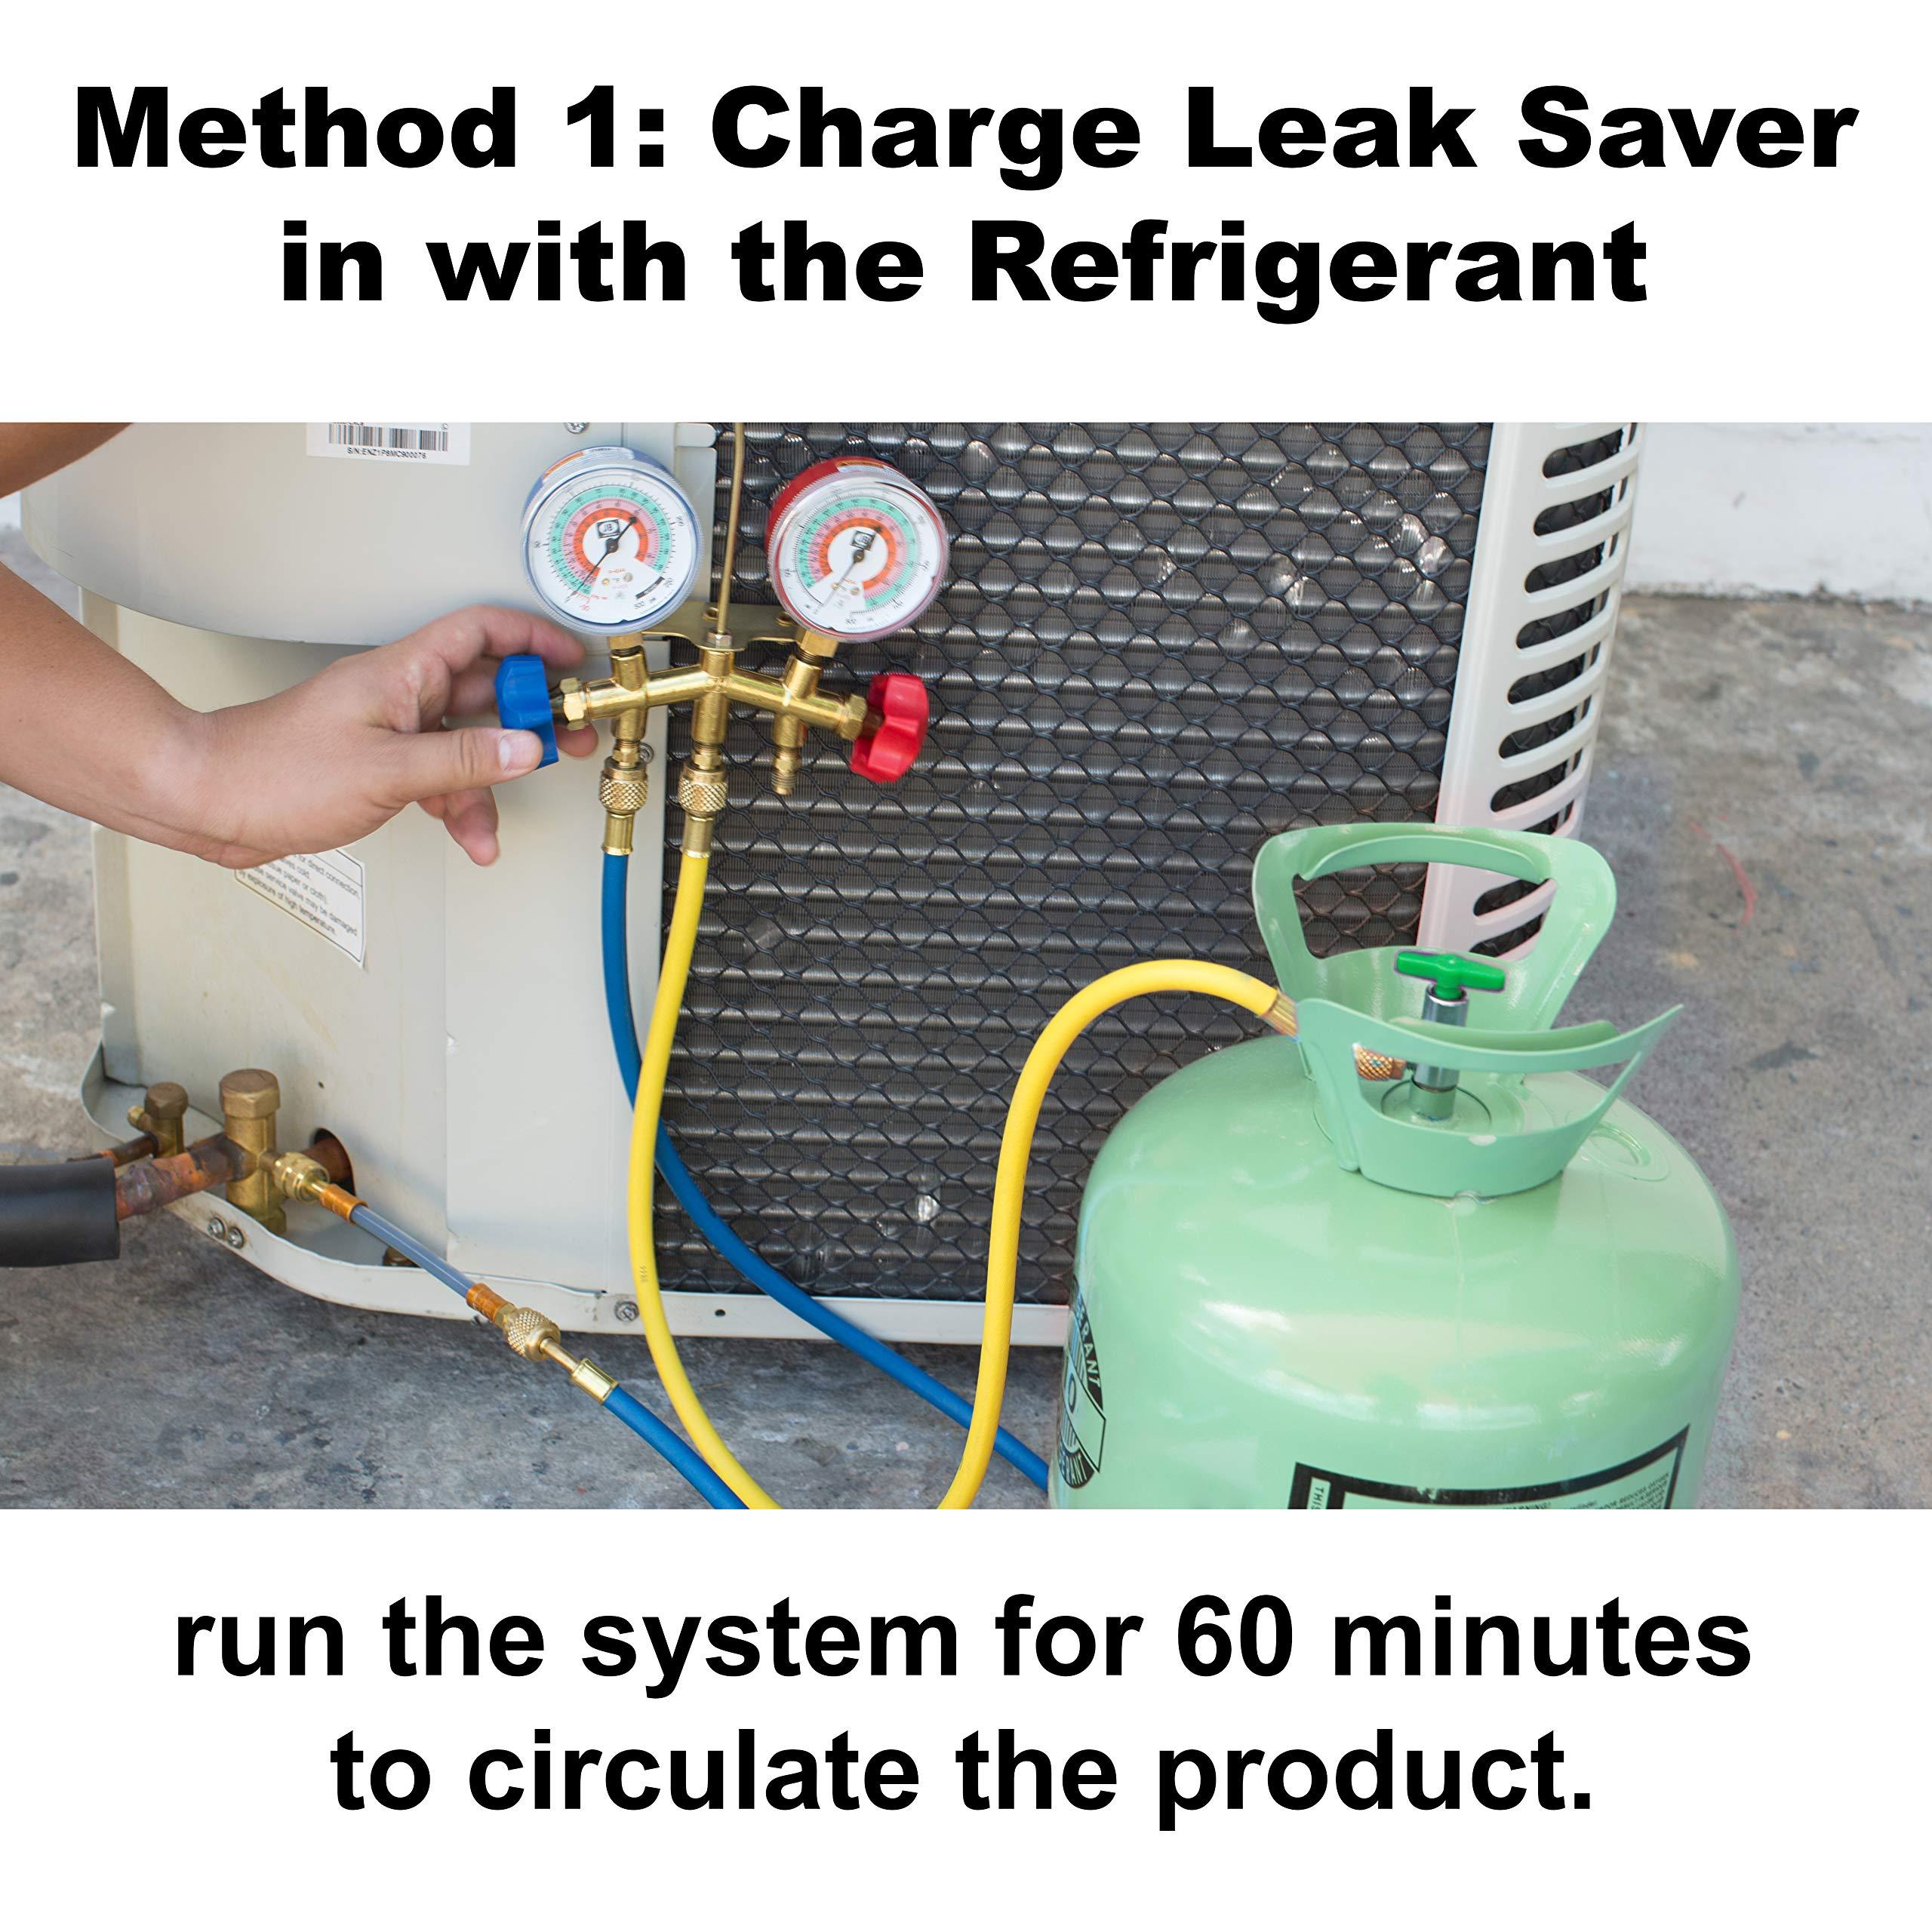 Leak Savers Direct Inject Refrigerant Leak Sealer with UV Dye (3 Pack) by Leak Savers (Image #4)